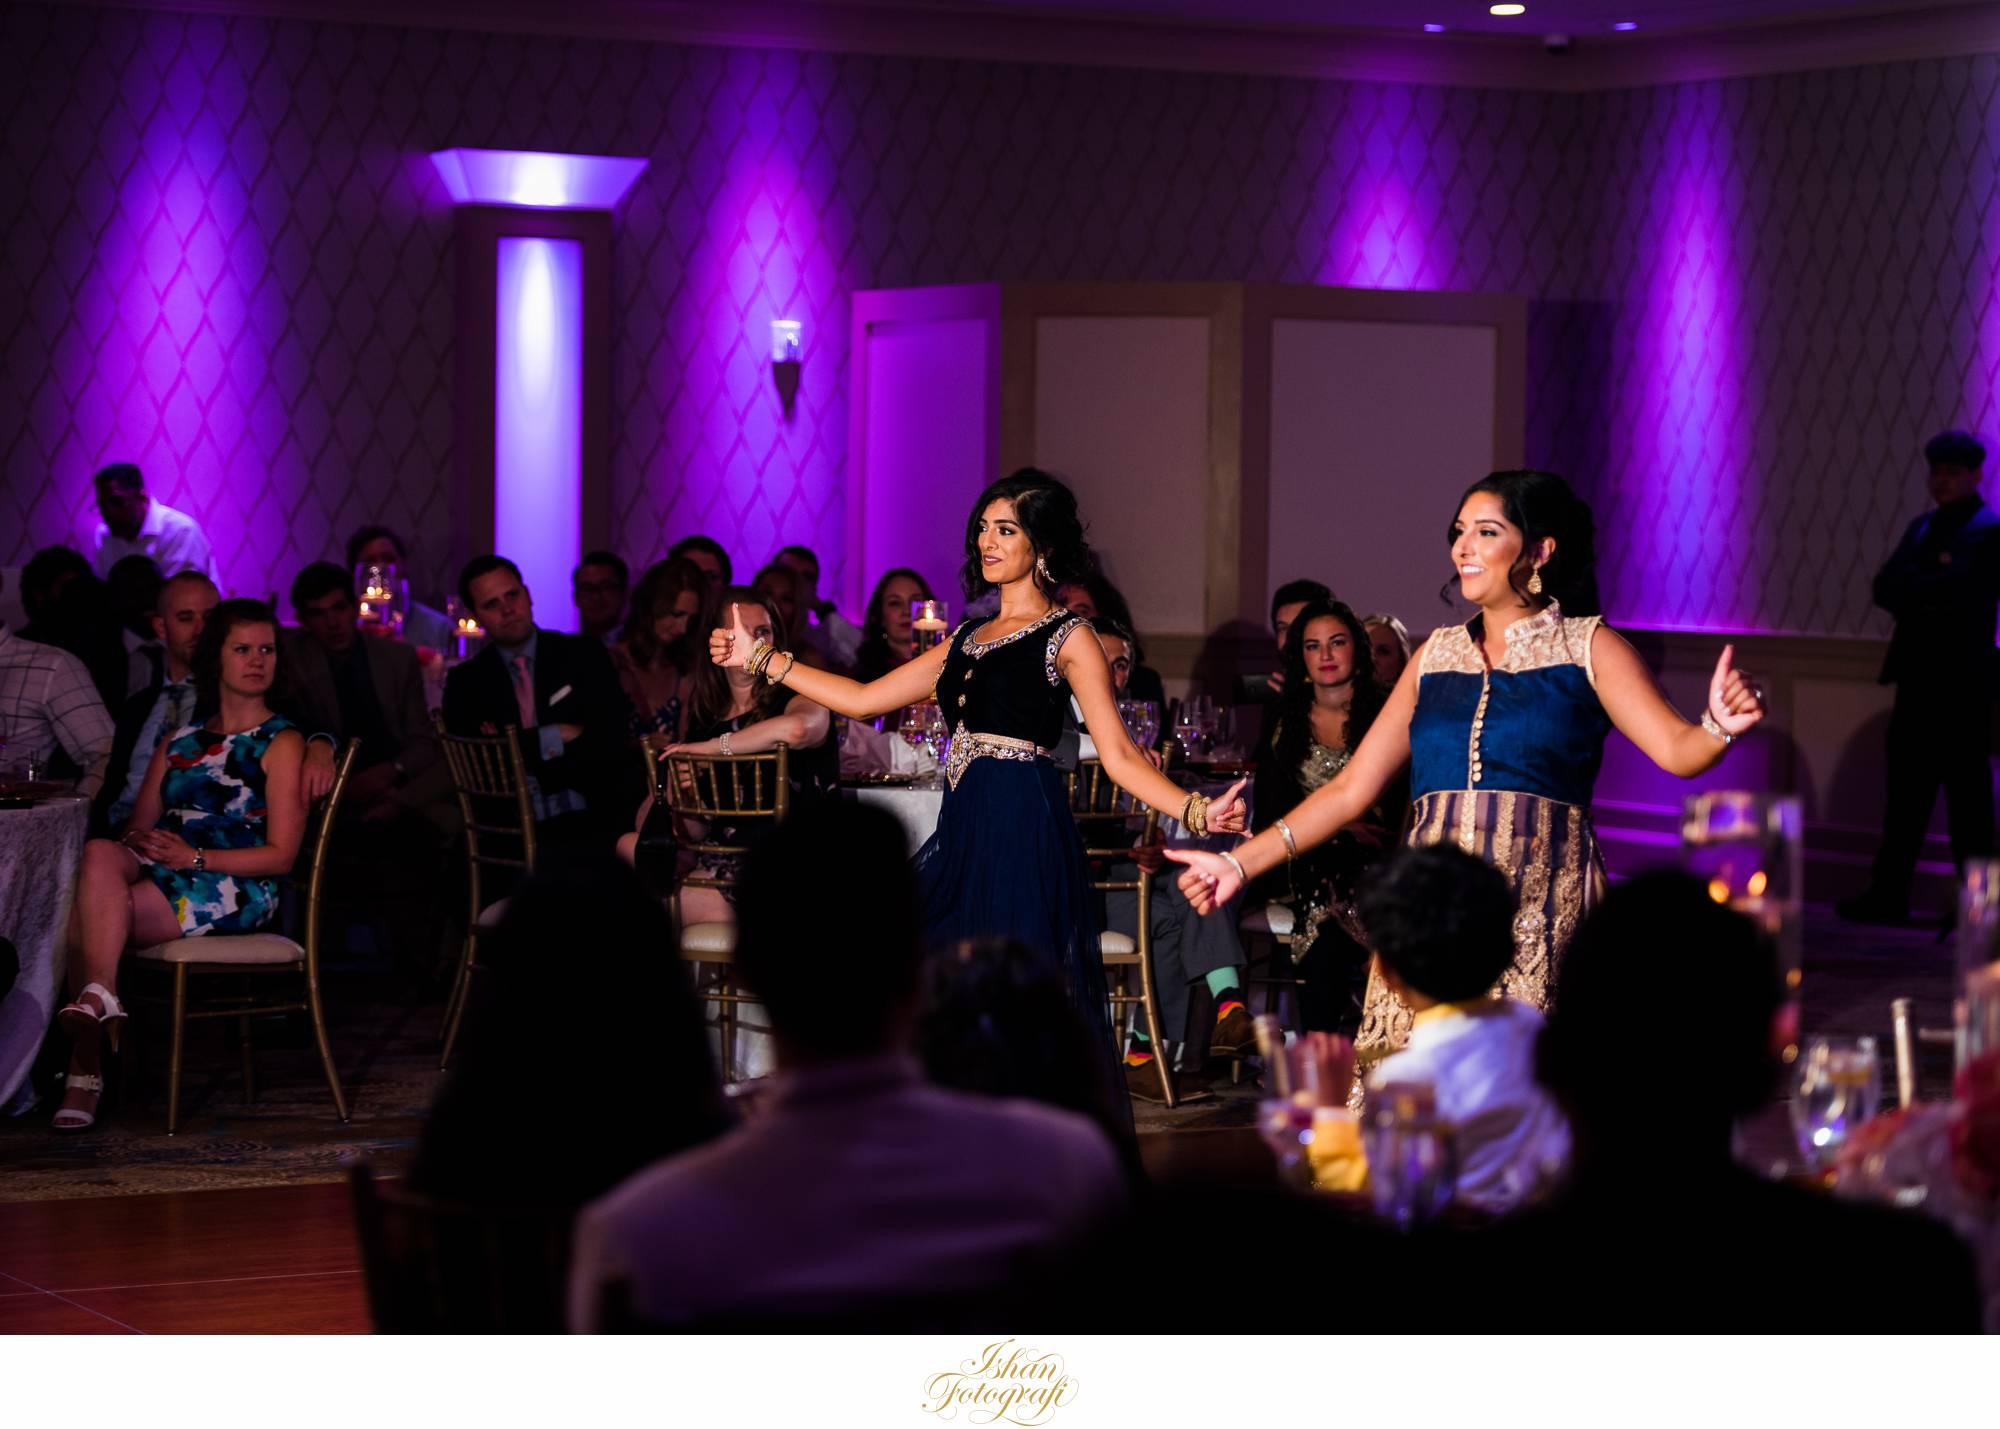 wedding-reception-photos-the-marigold-new-jersey